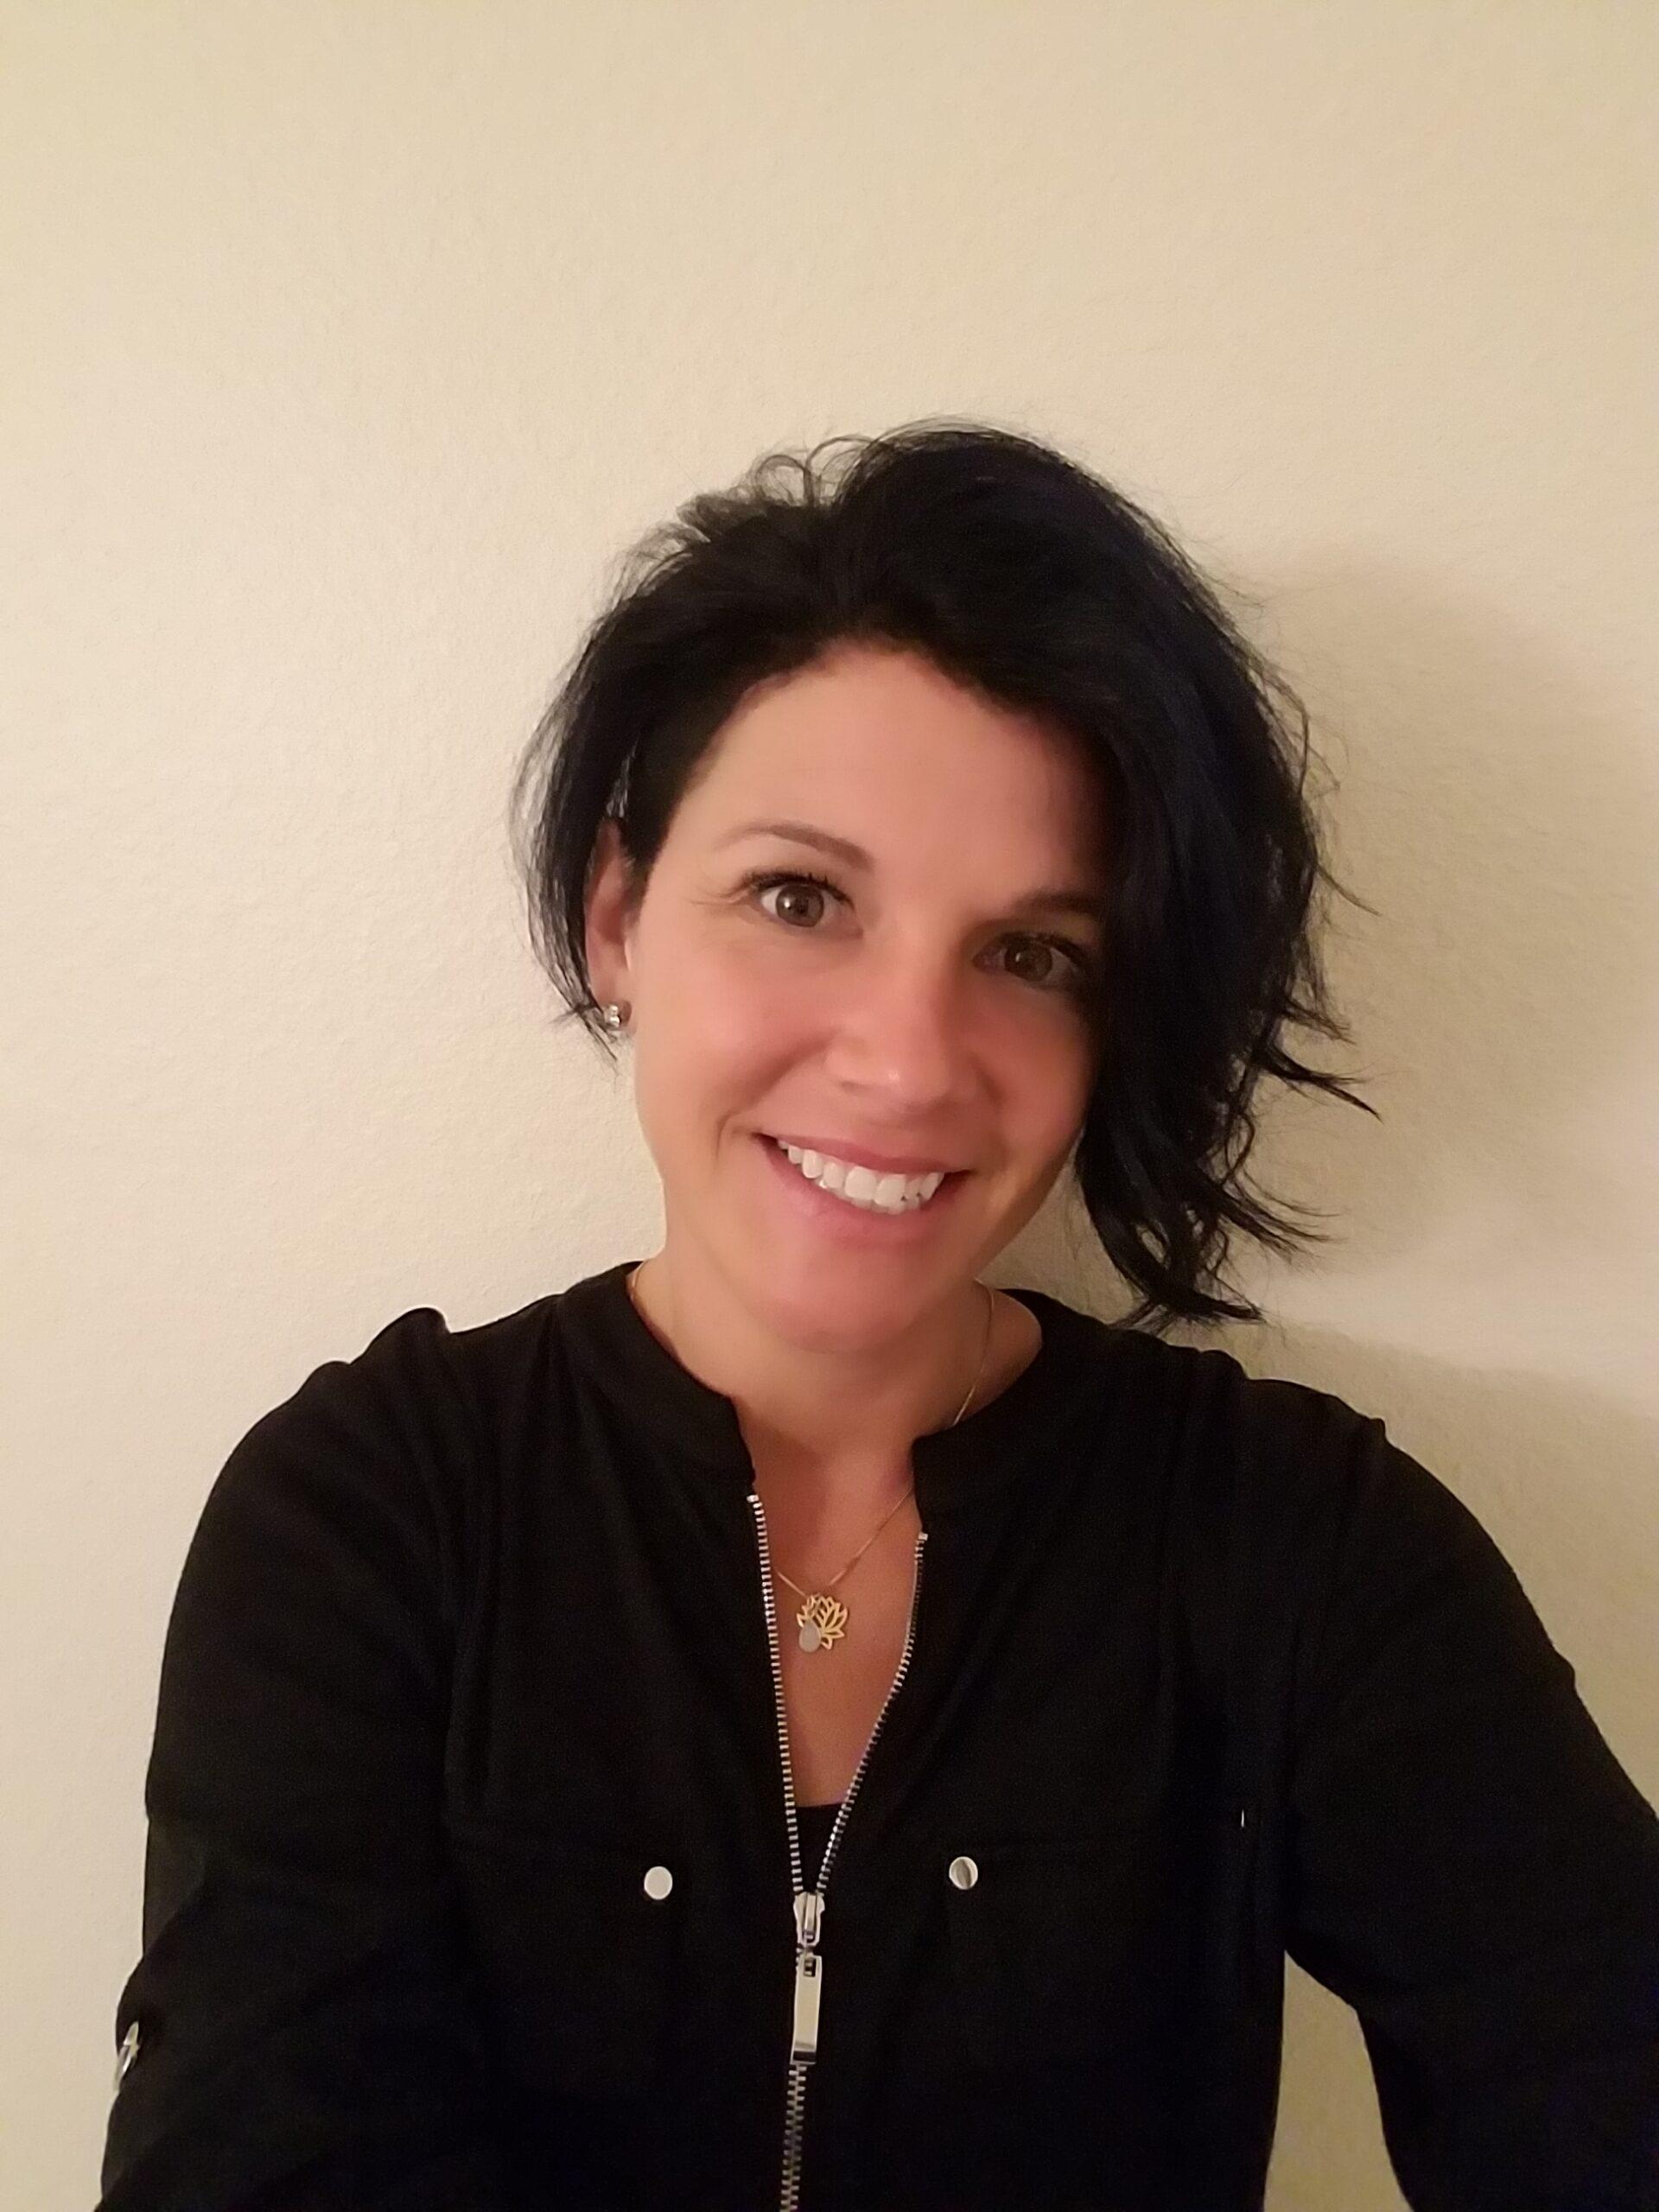 Erica Petree